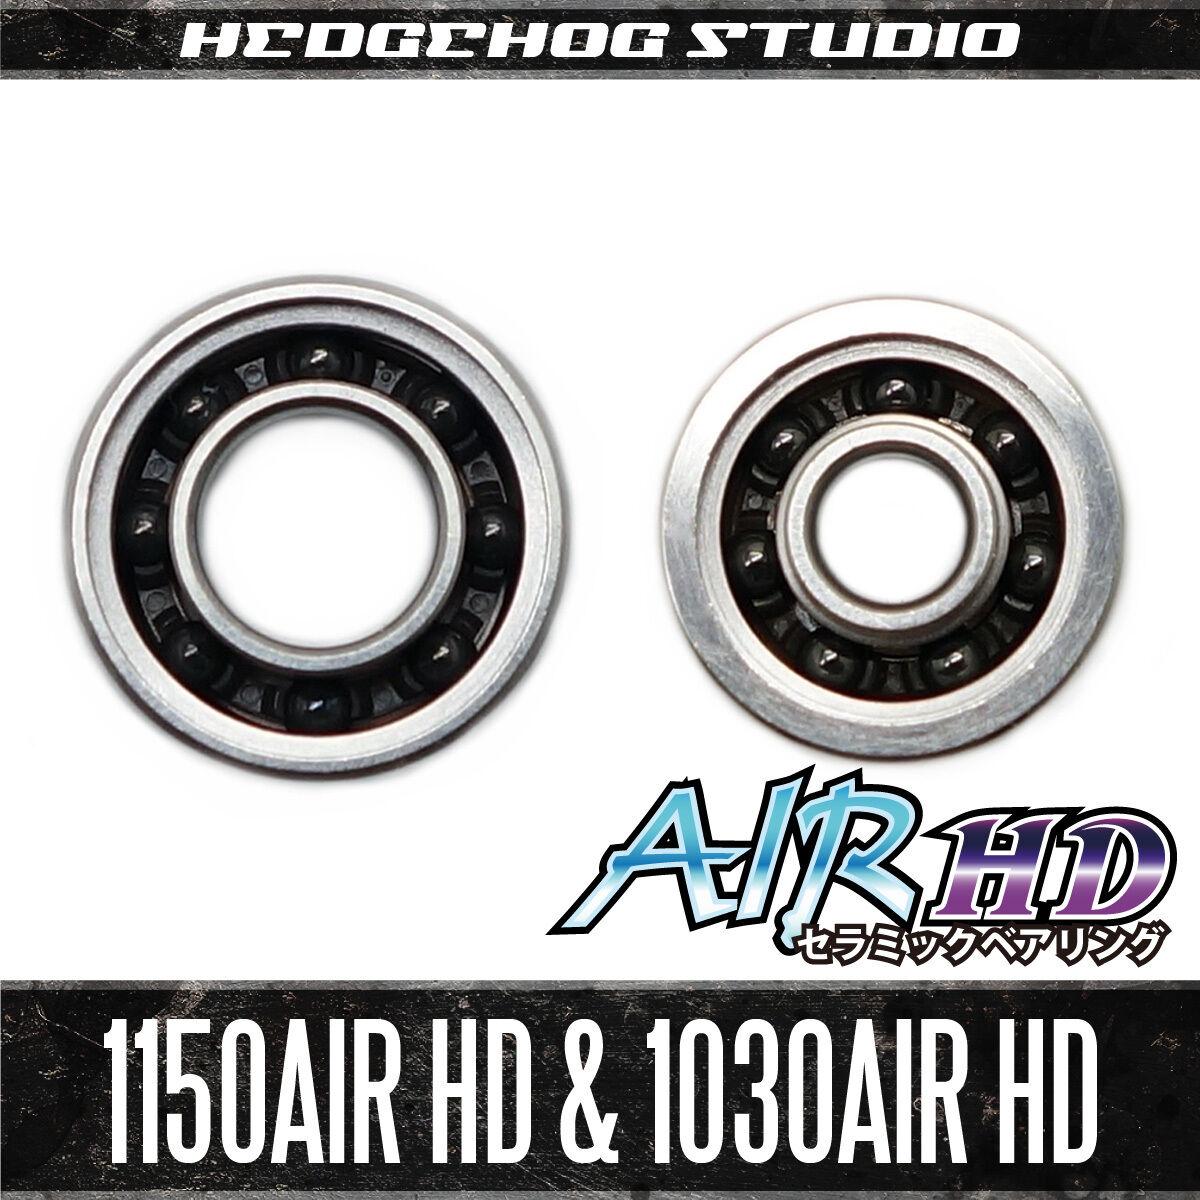 HEDGEHOG STUDIO 1150AIR HD & 1030AIR HD - CERAMIC BEARING - for Revo,Elite,MGX